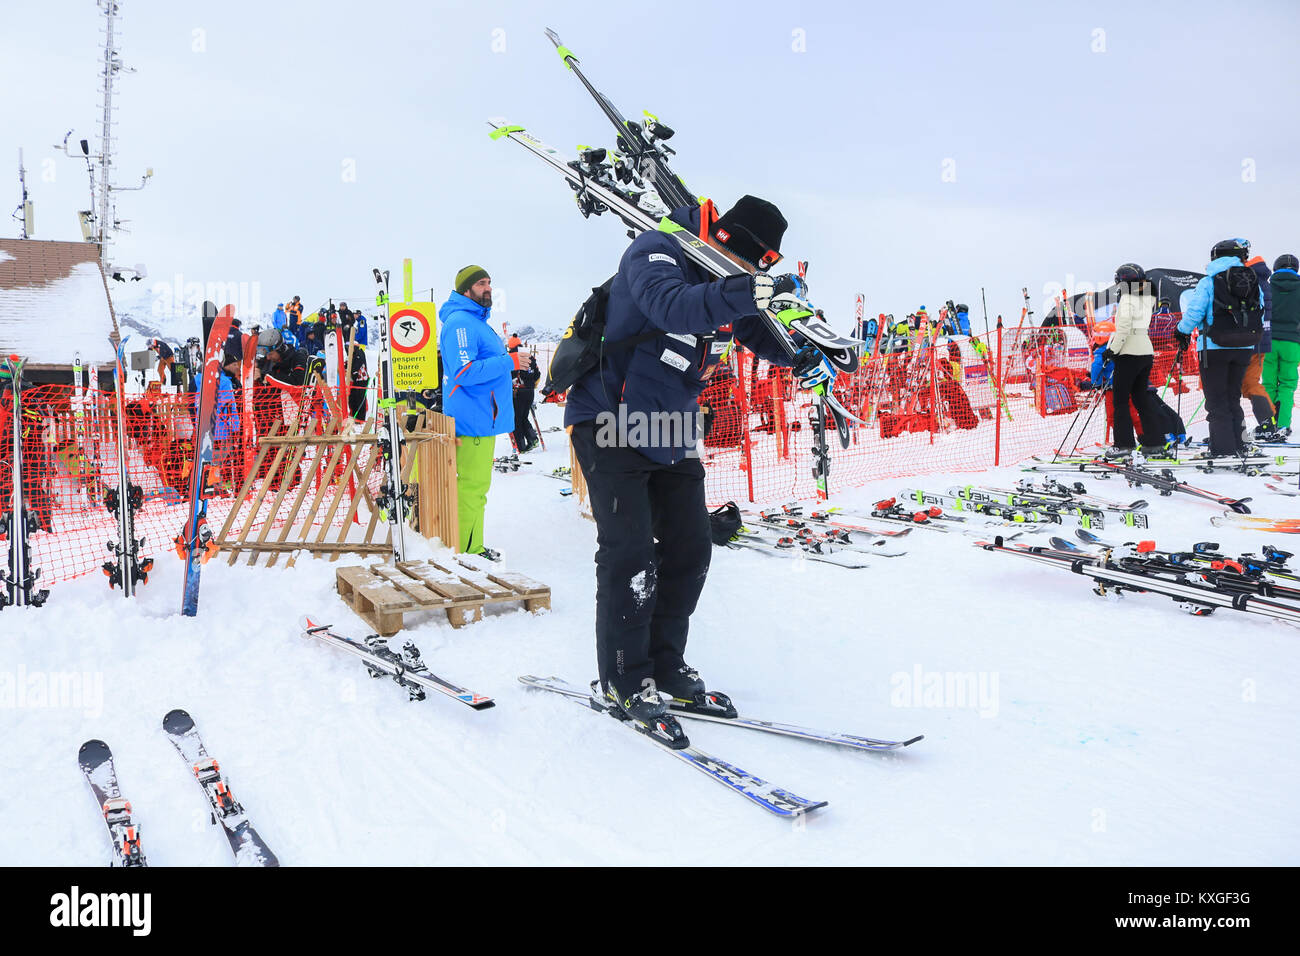 Lauberhorn Wengen, Switzerland. 10th Jan, 2018. Participants train ahead of FIS Alpine Ski World Cup held in Lauberhorn - Stock Image